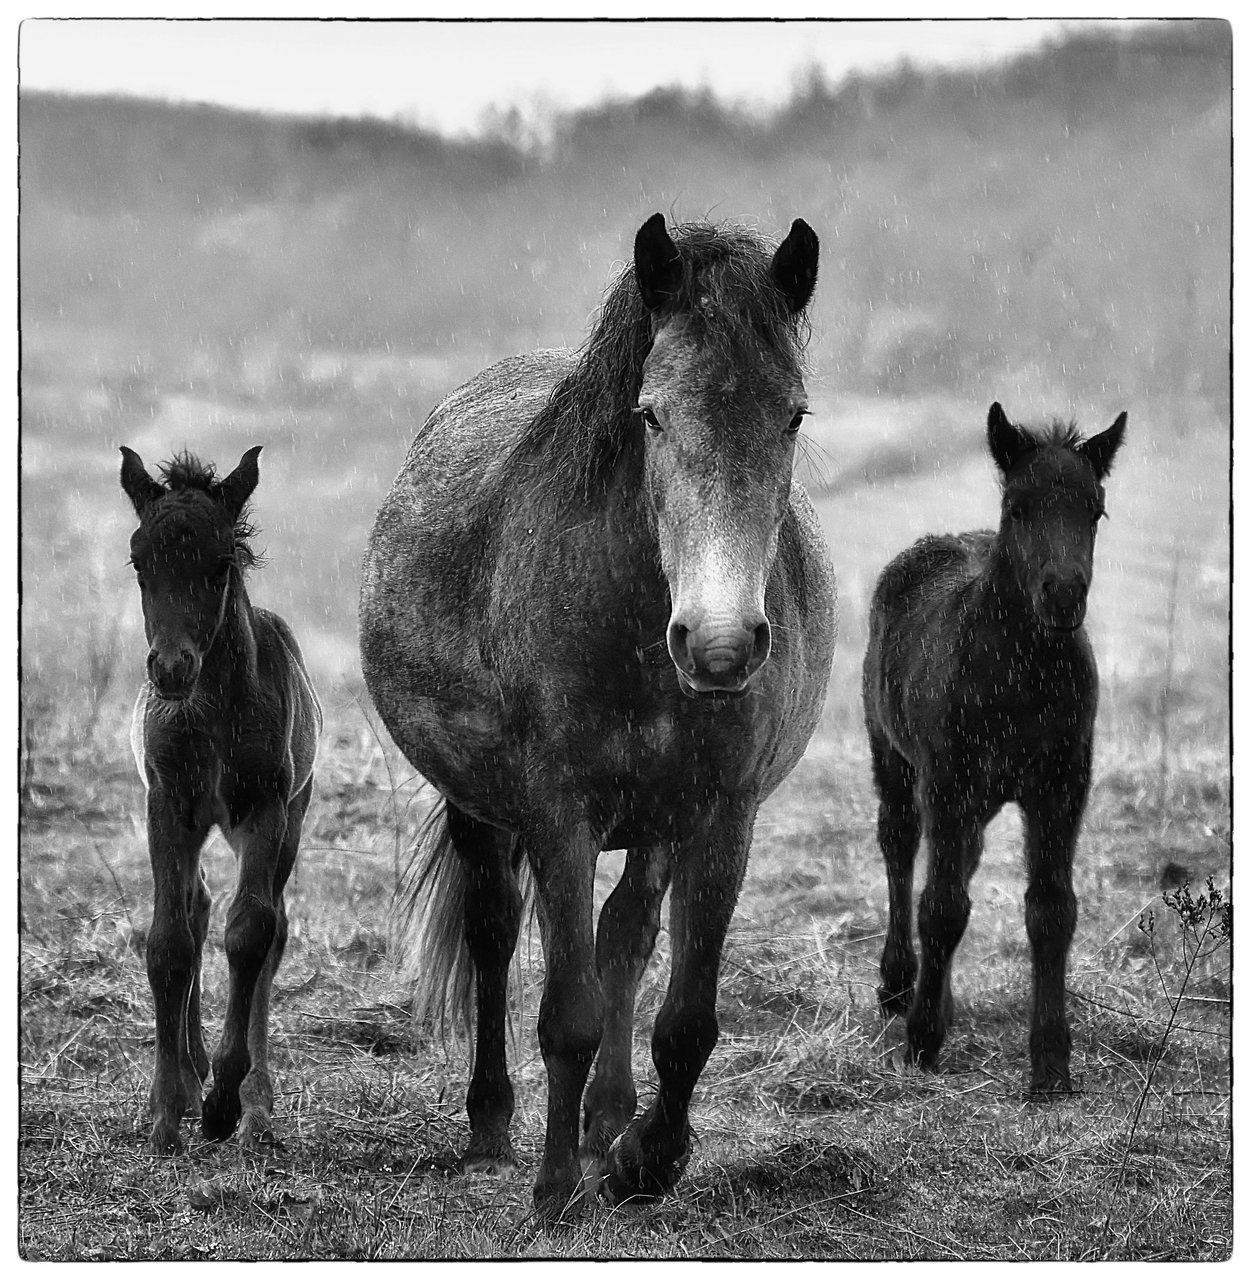 Photo in Everything else | Author ivan barov - kolmik | PHOTO FORUM